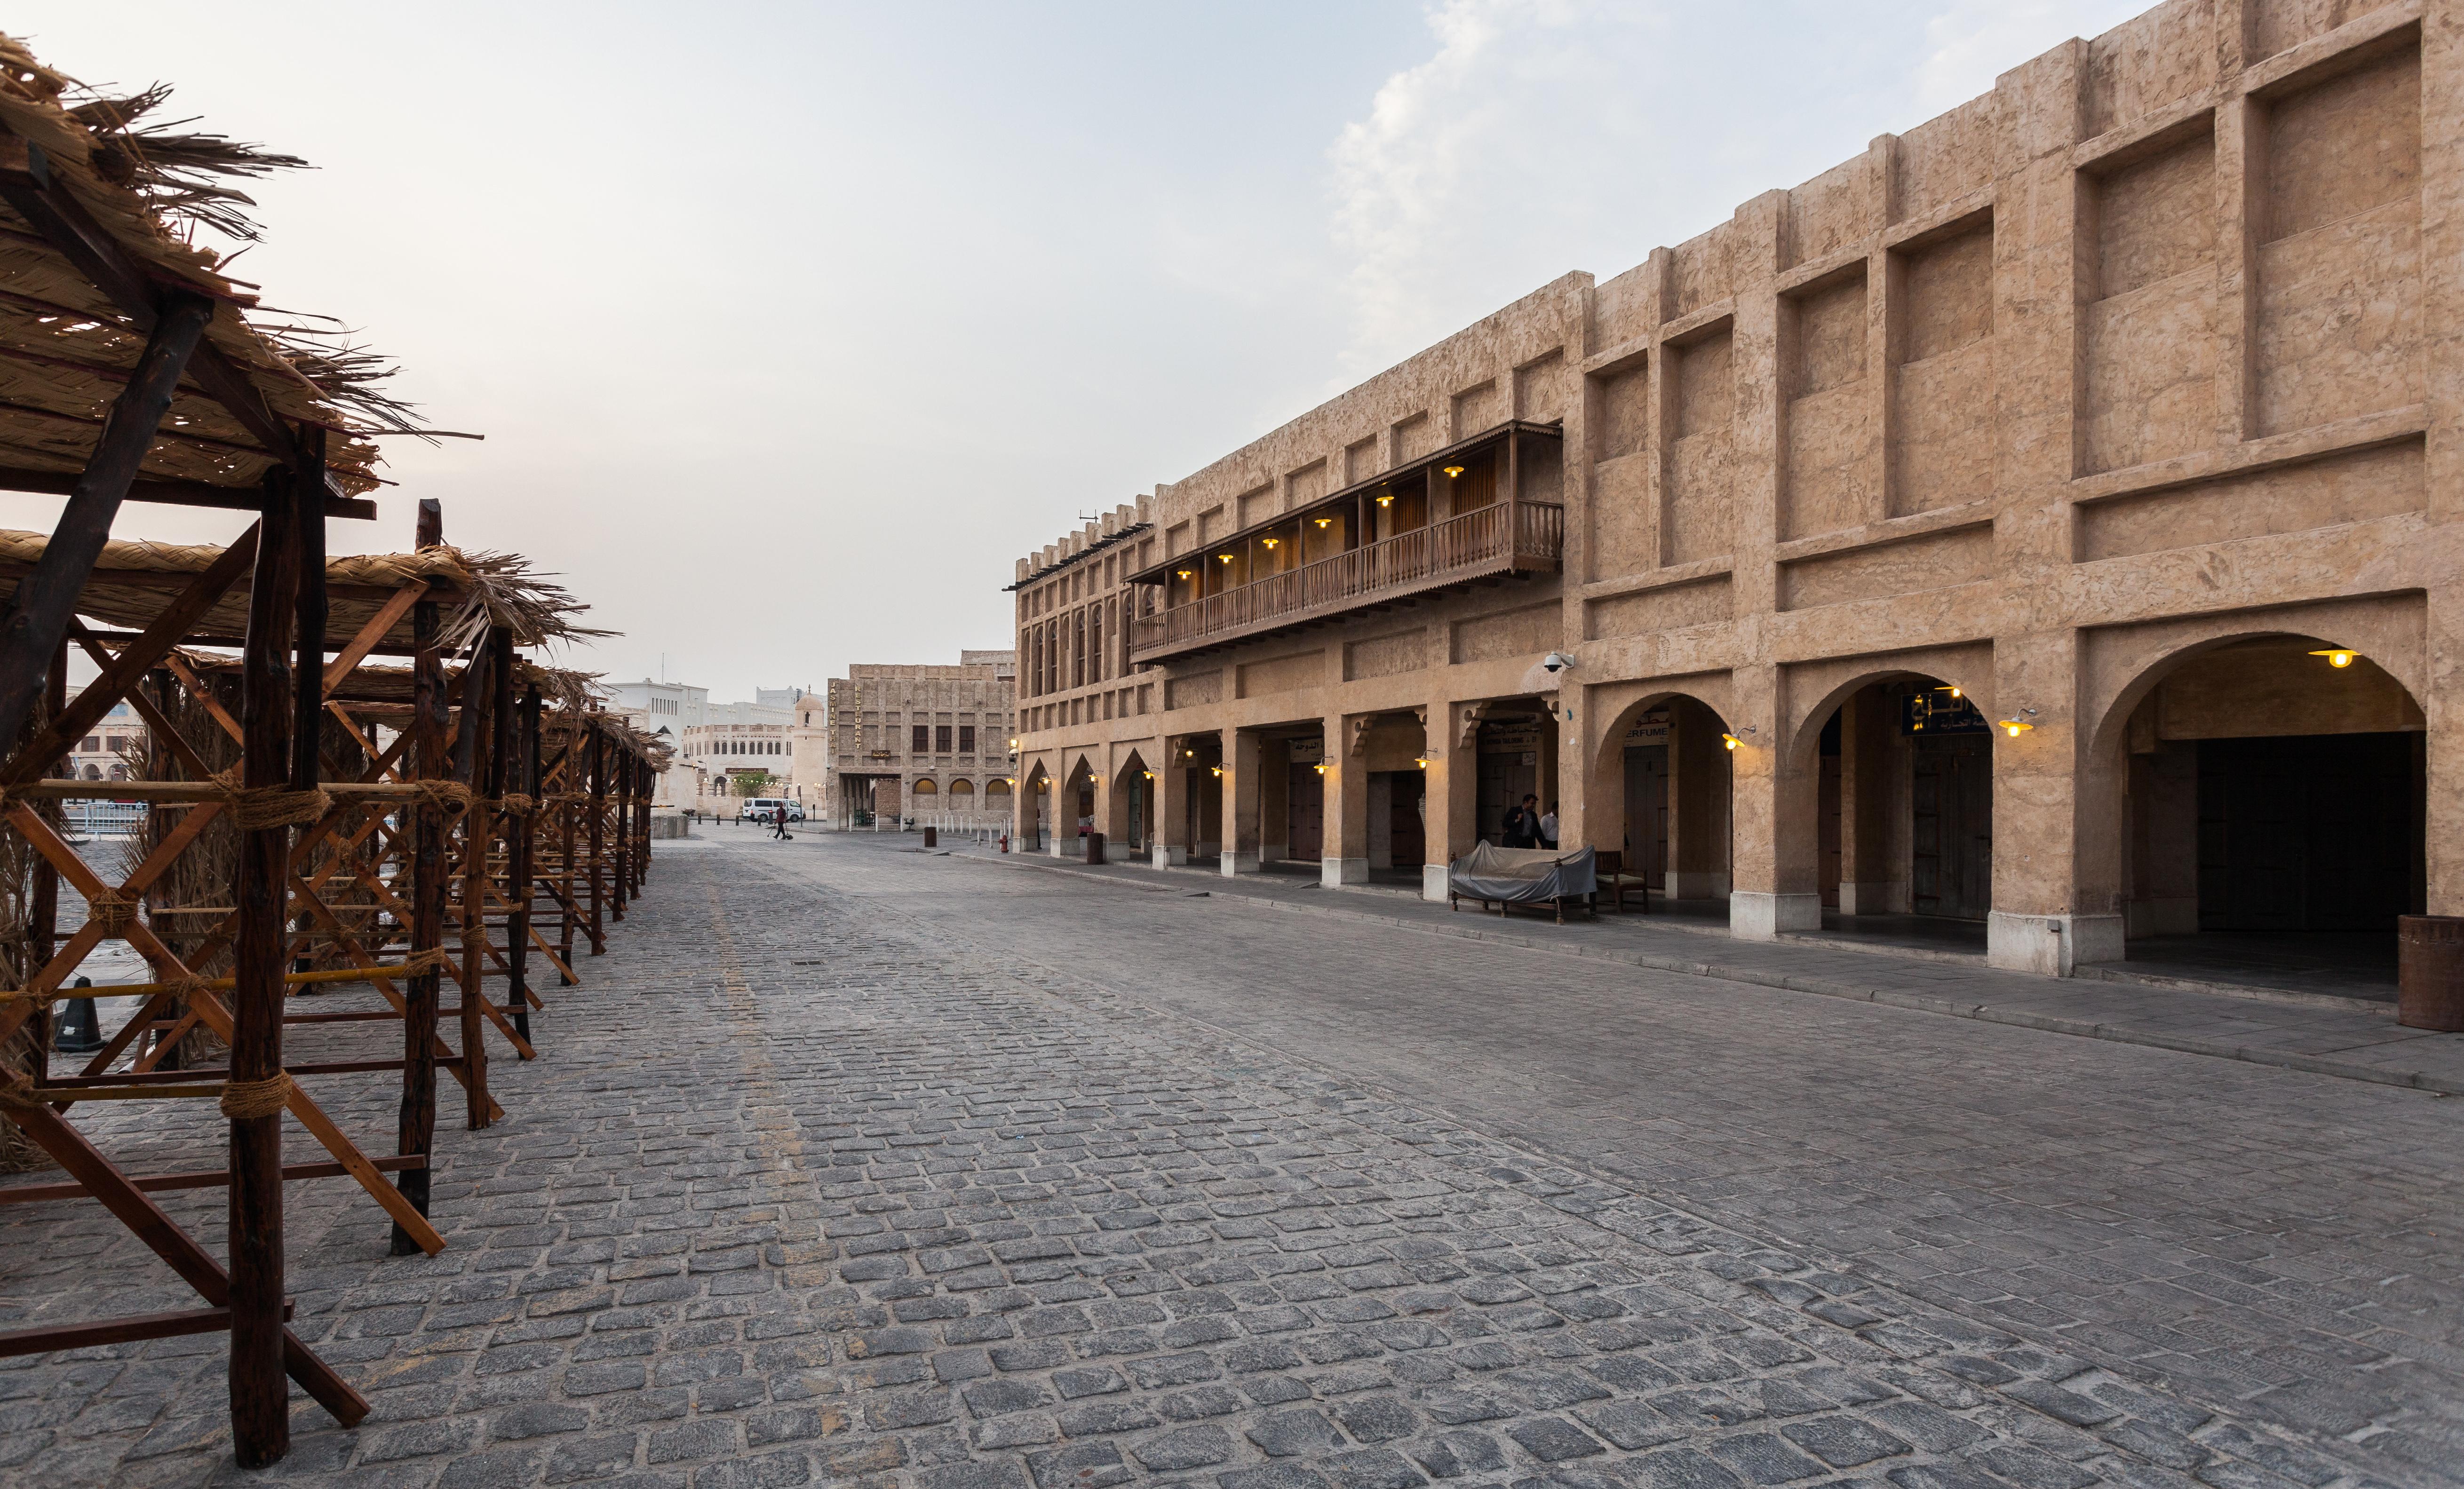 File:Souq Waqif, Doha, Catar, 2013-08-05, DD 70 JPG - Wikimedia Commons